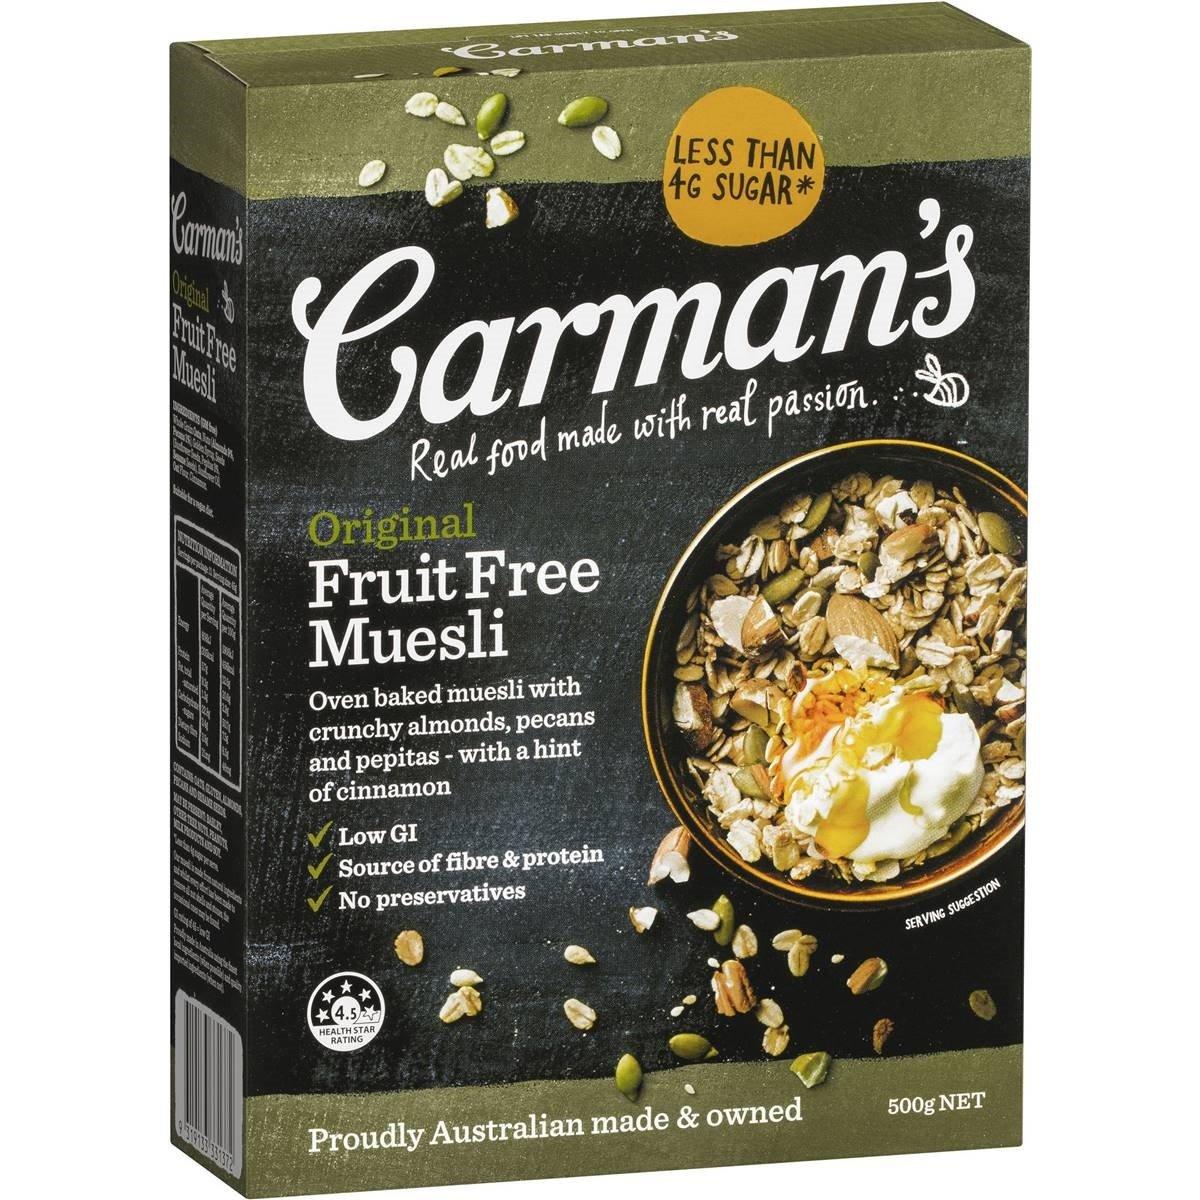 Carmans Original Muesli 500g by Carman's Kitchen